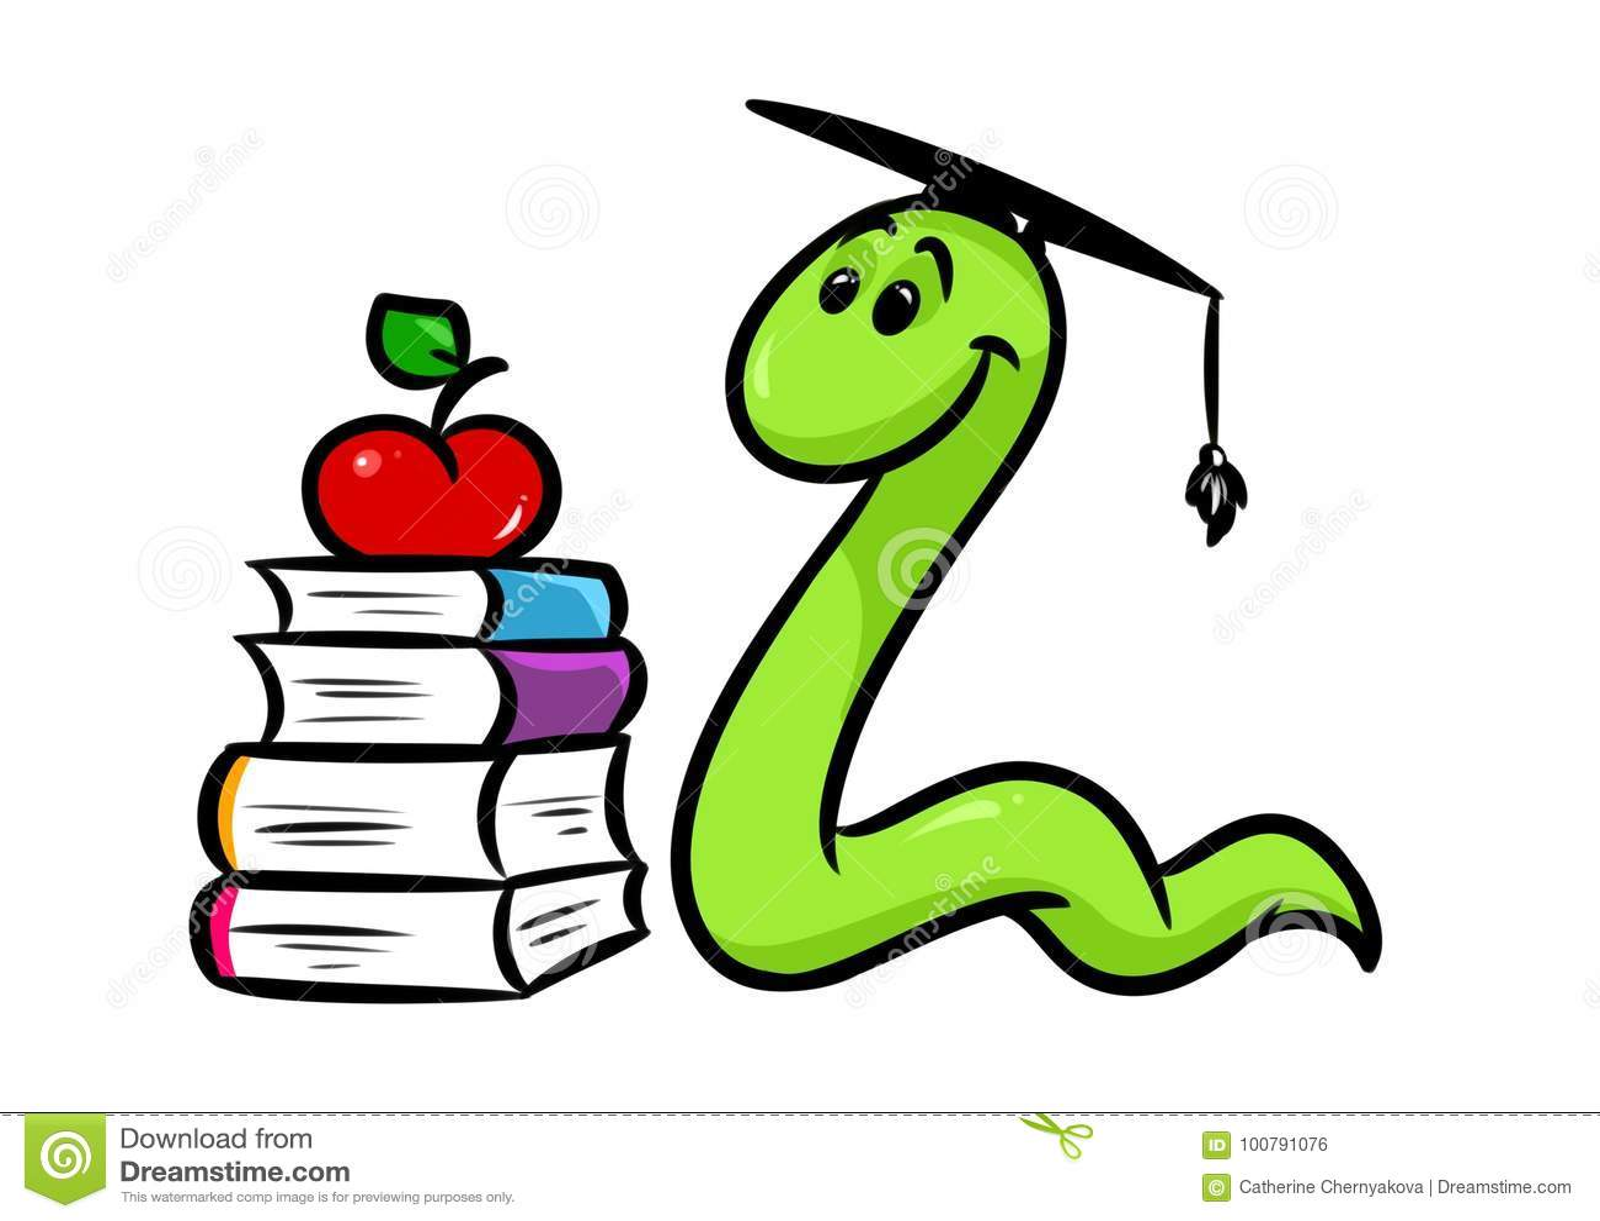 Bookworm Book Teaching Cartoon Stock Illustration Illustration Of